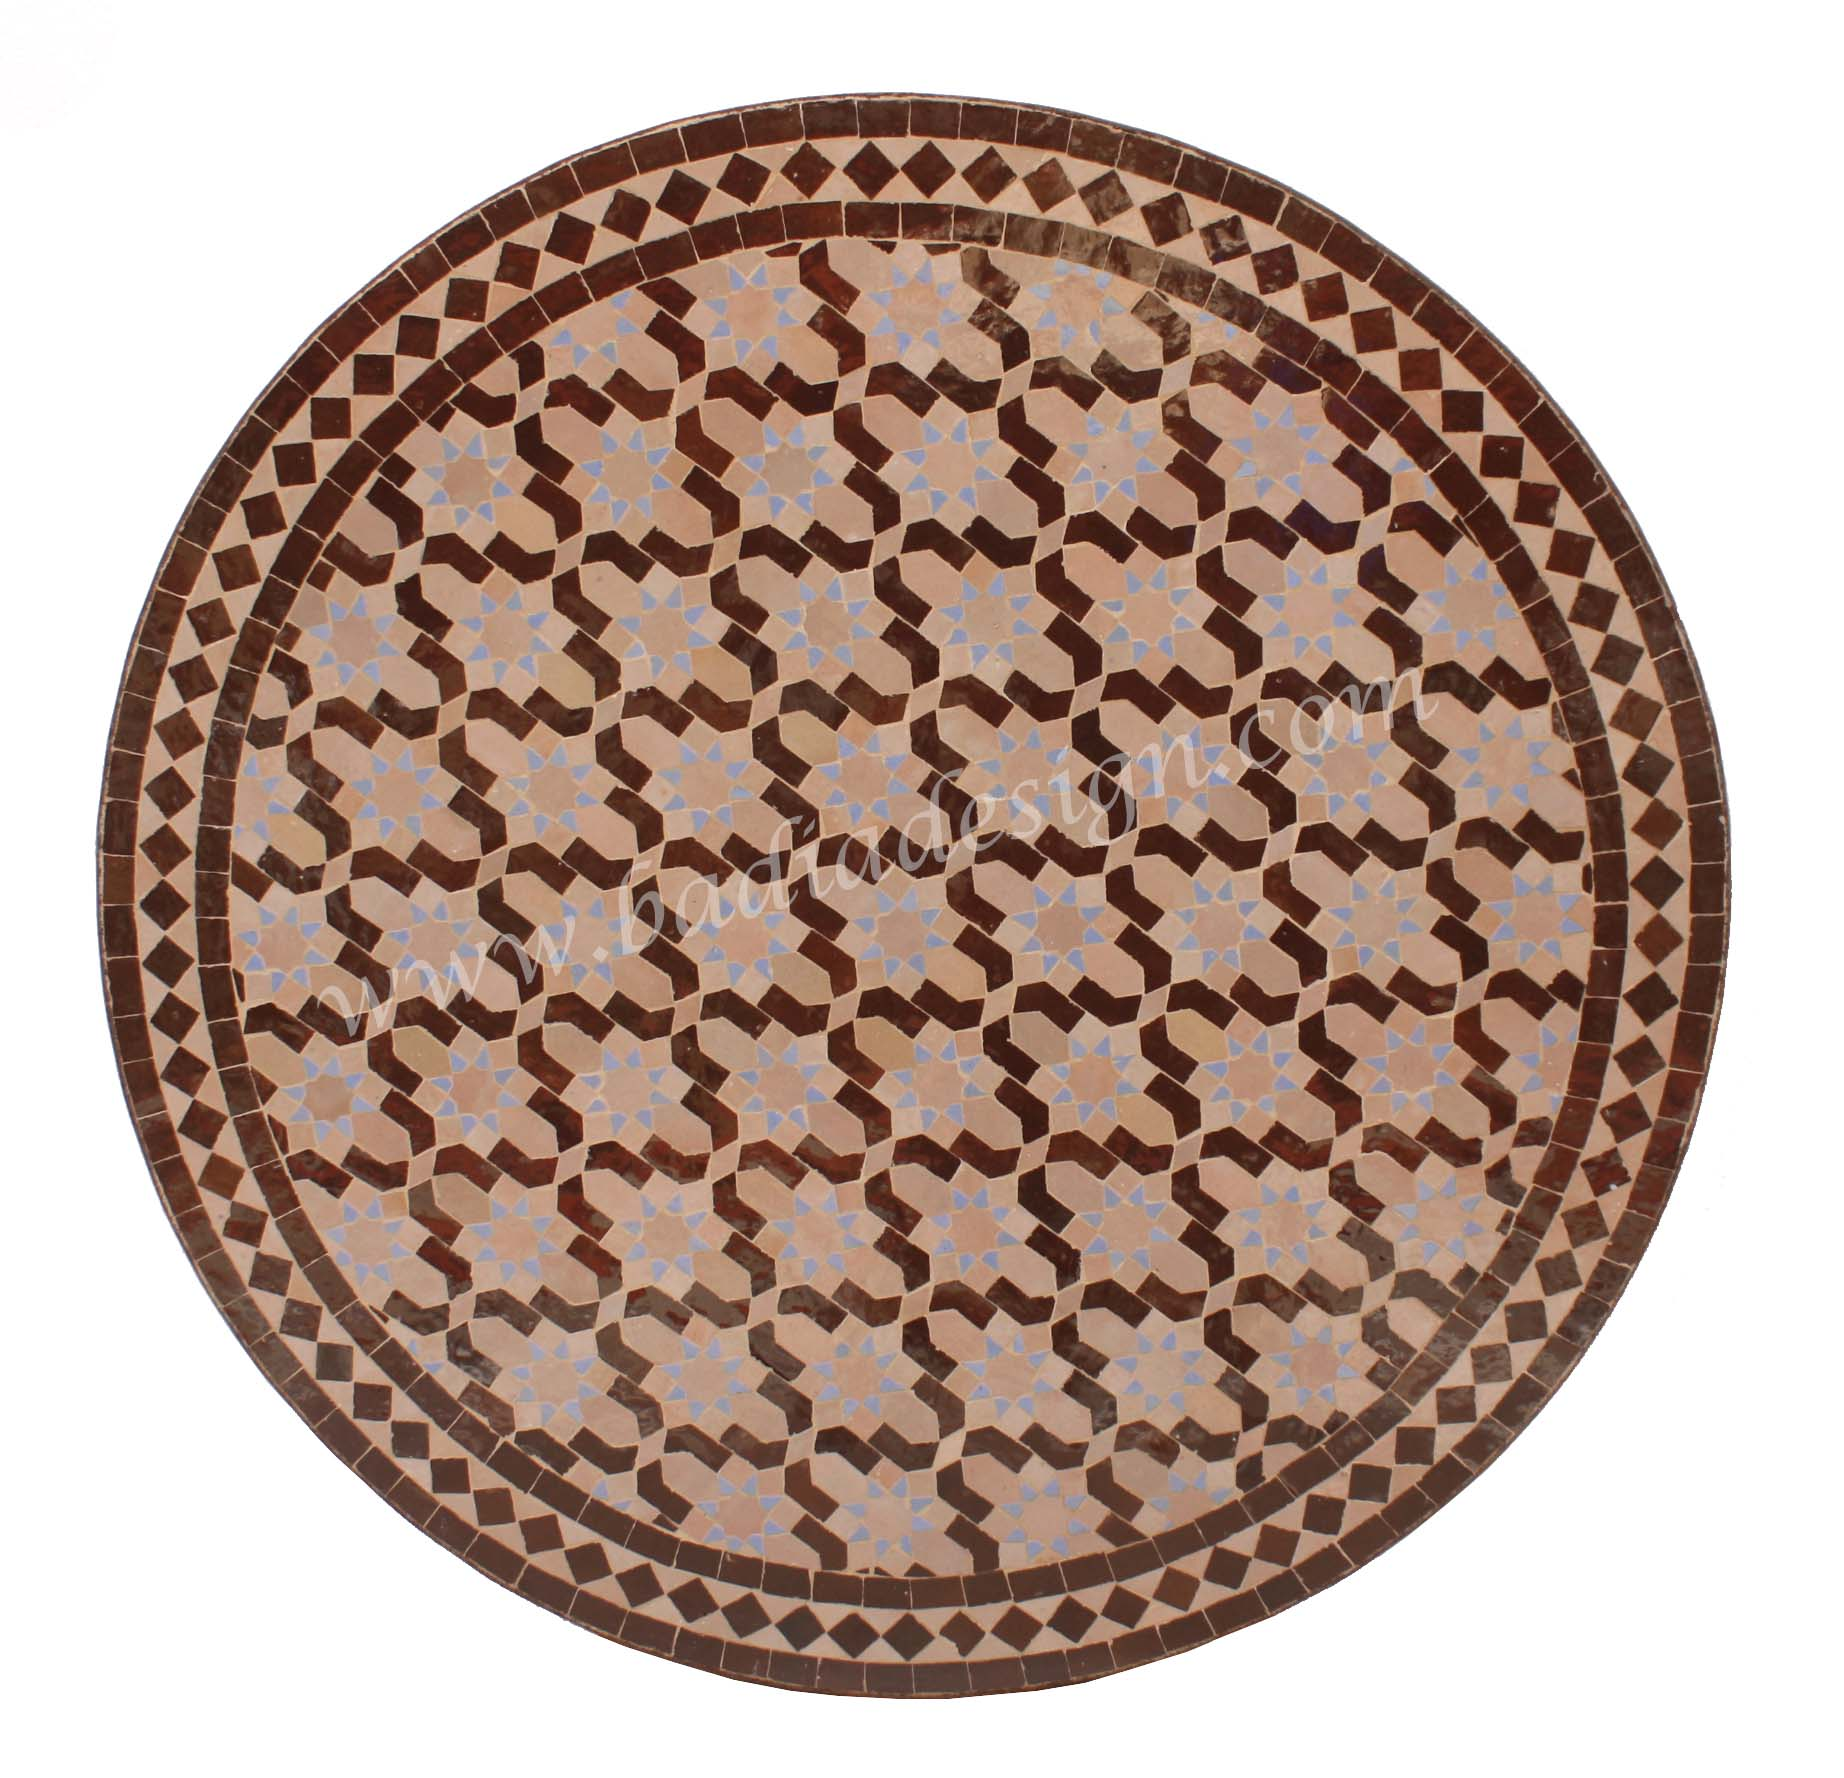 moroccan-ceramic-tile-table-top-mtr245.jpg